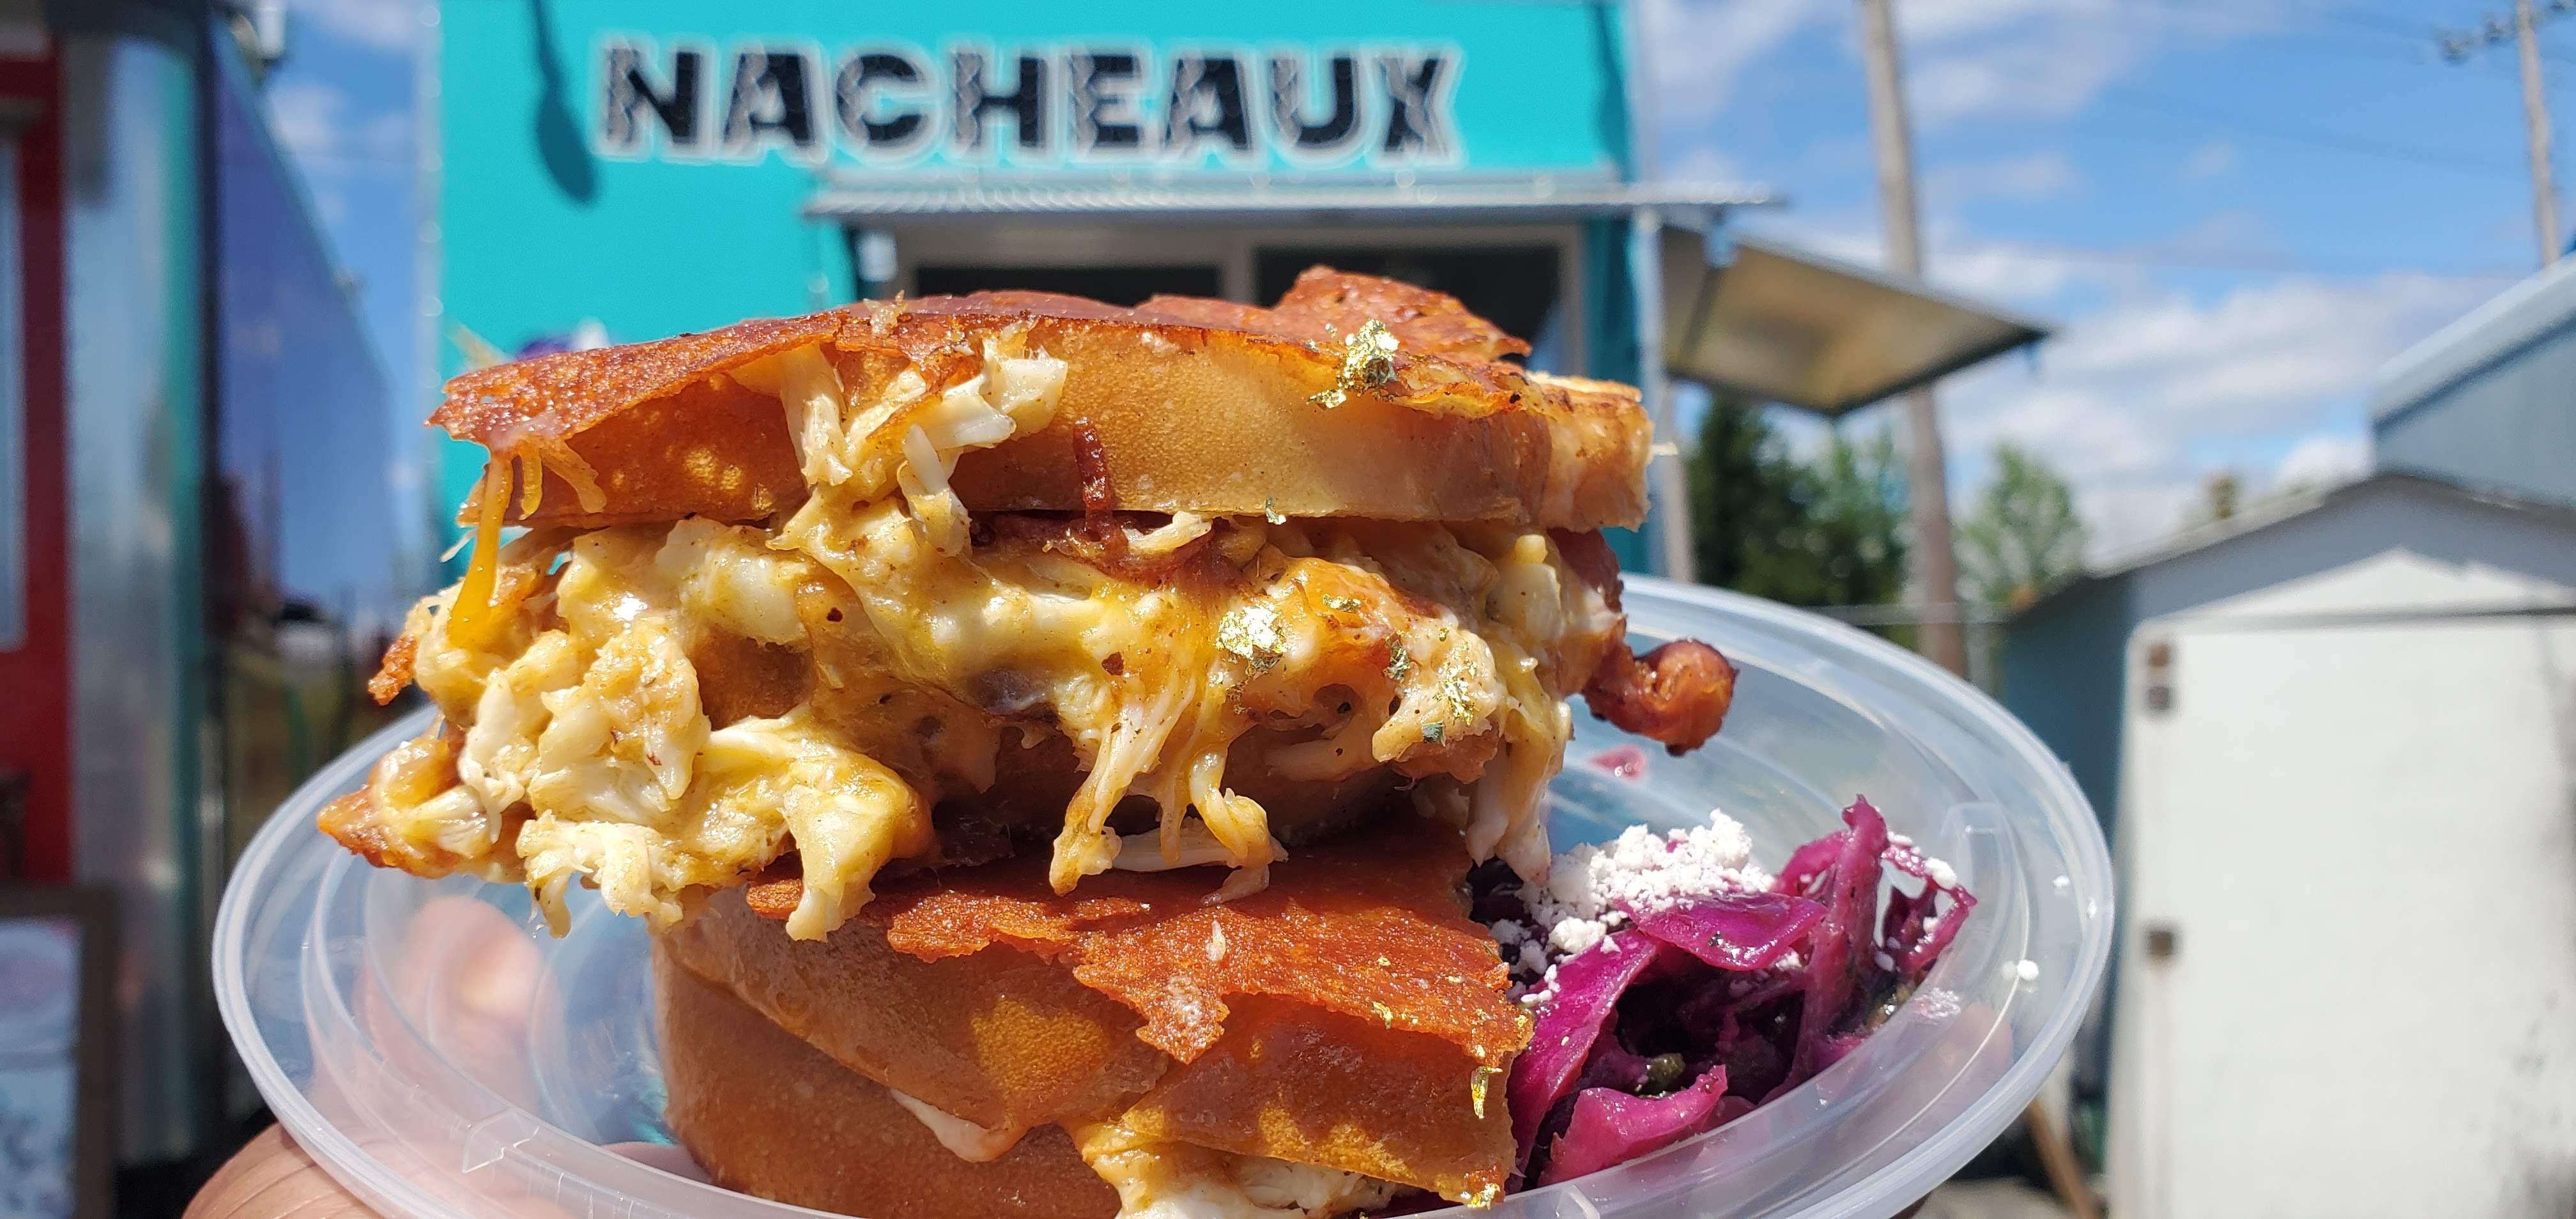 Nacheaux food cart sandwich